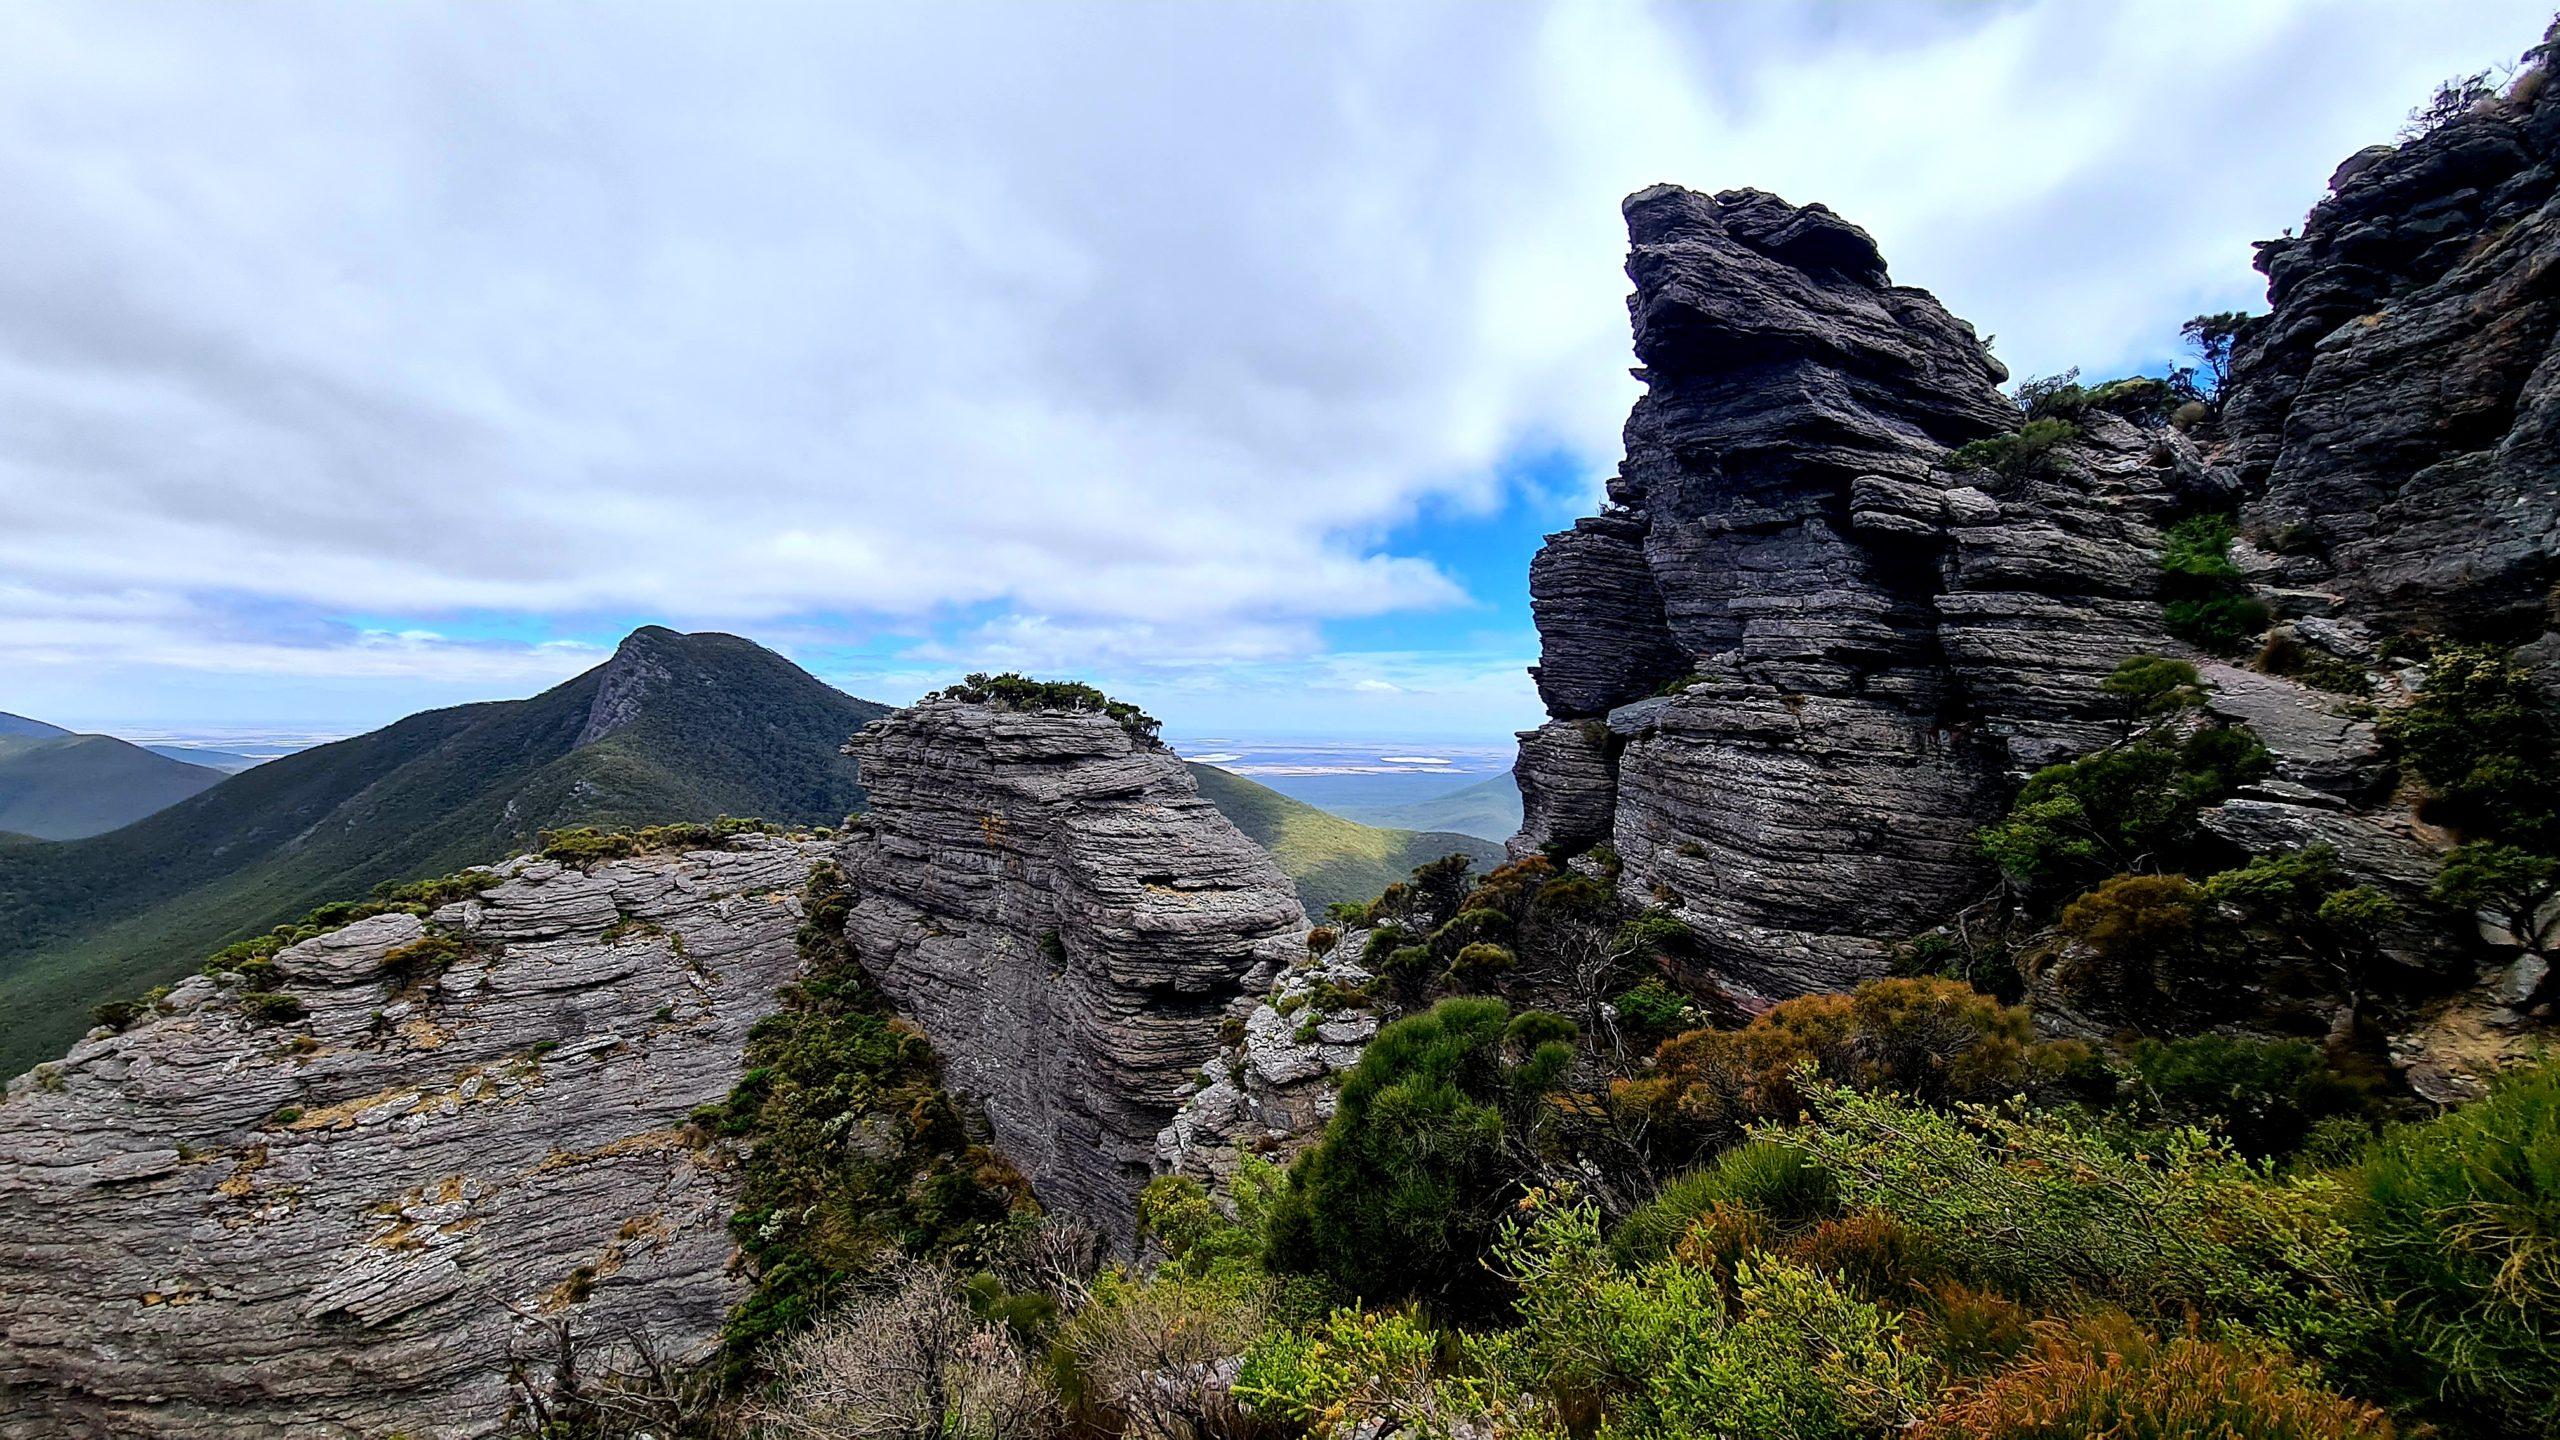 Talyuberlup Peak